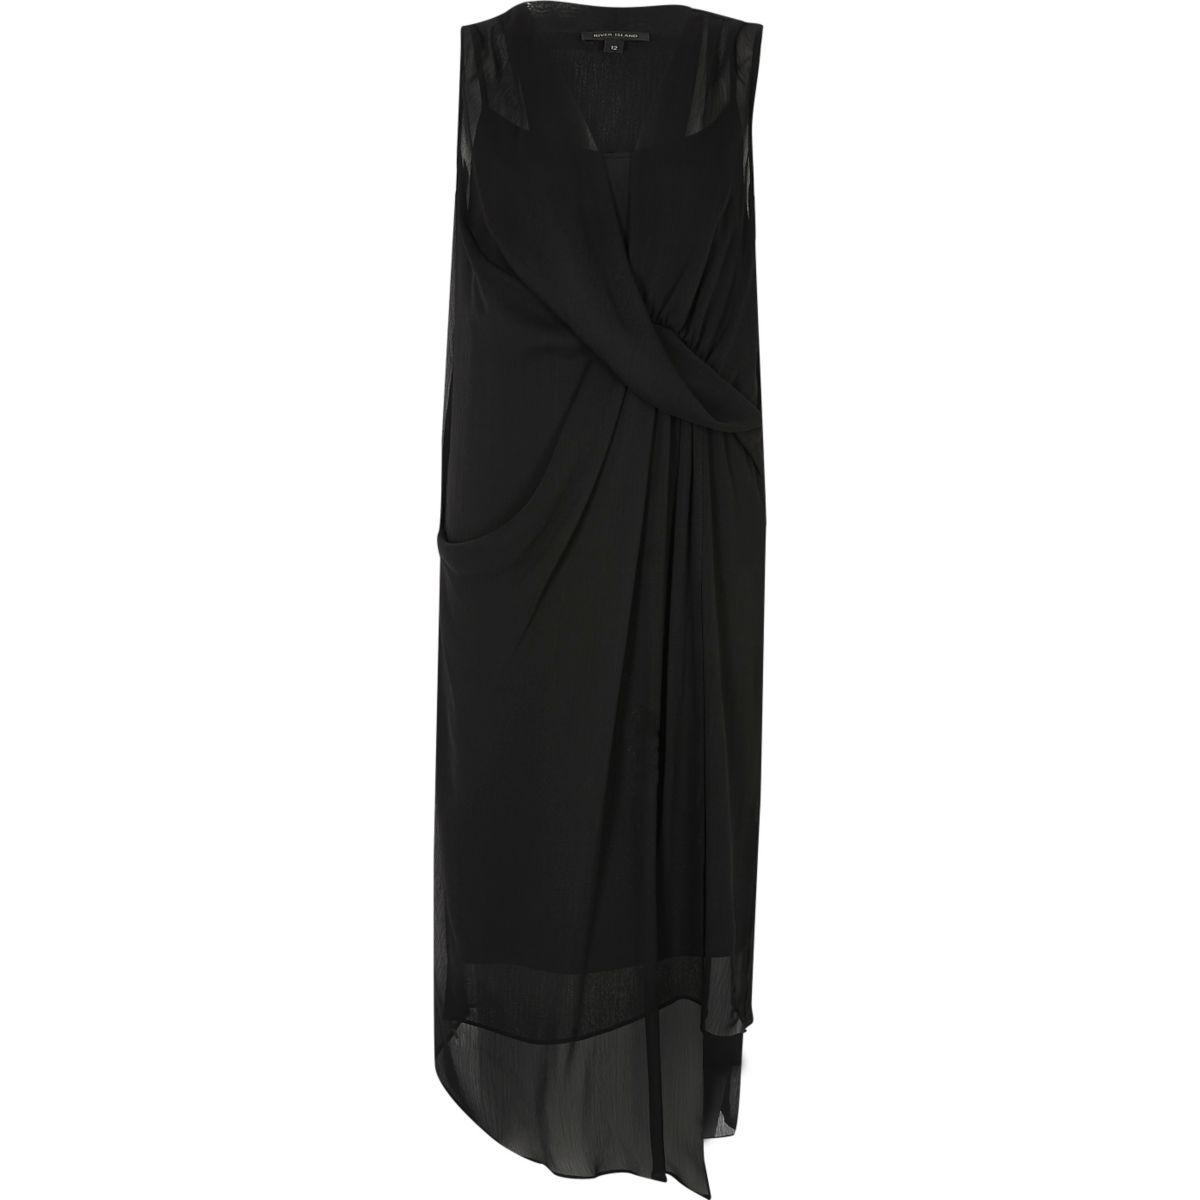 Black drape front swing dress